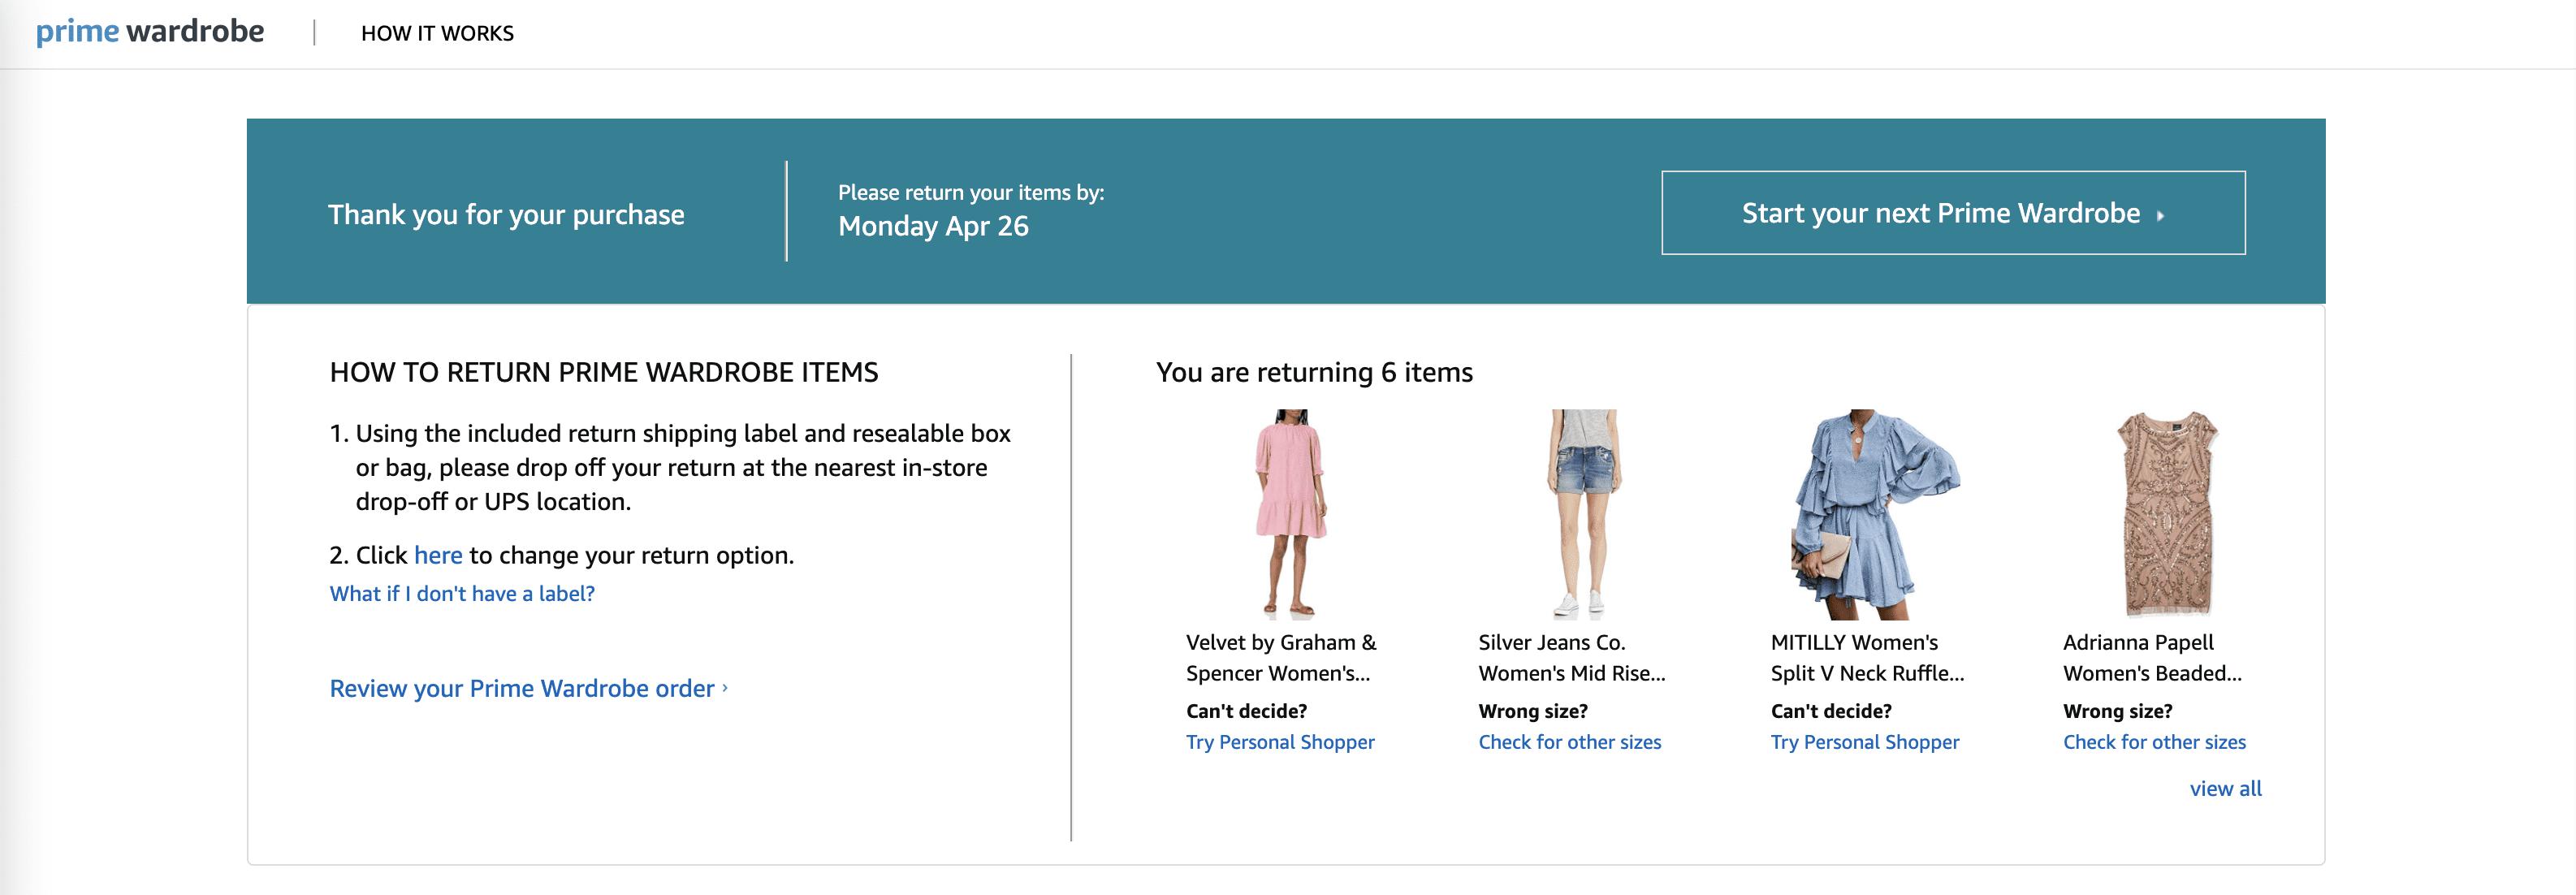 Return Amazon Prime Wardrobe